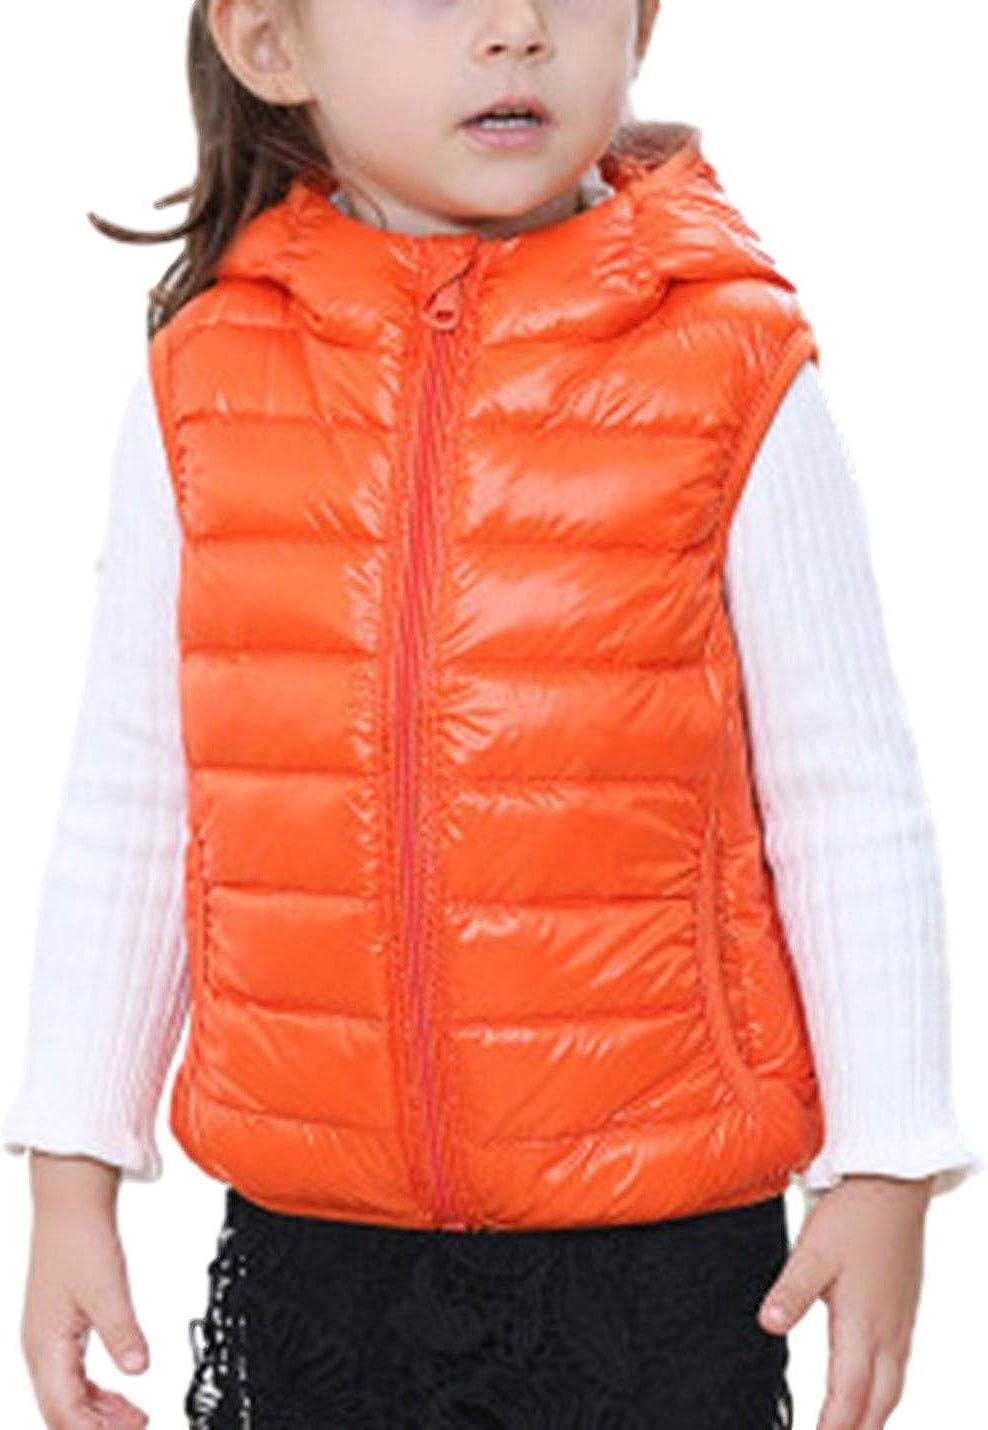 AMEBELLE Toddler Boys Girl's Lightweight Water-Resistant Zip Up Hooded Puffer Vest